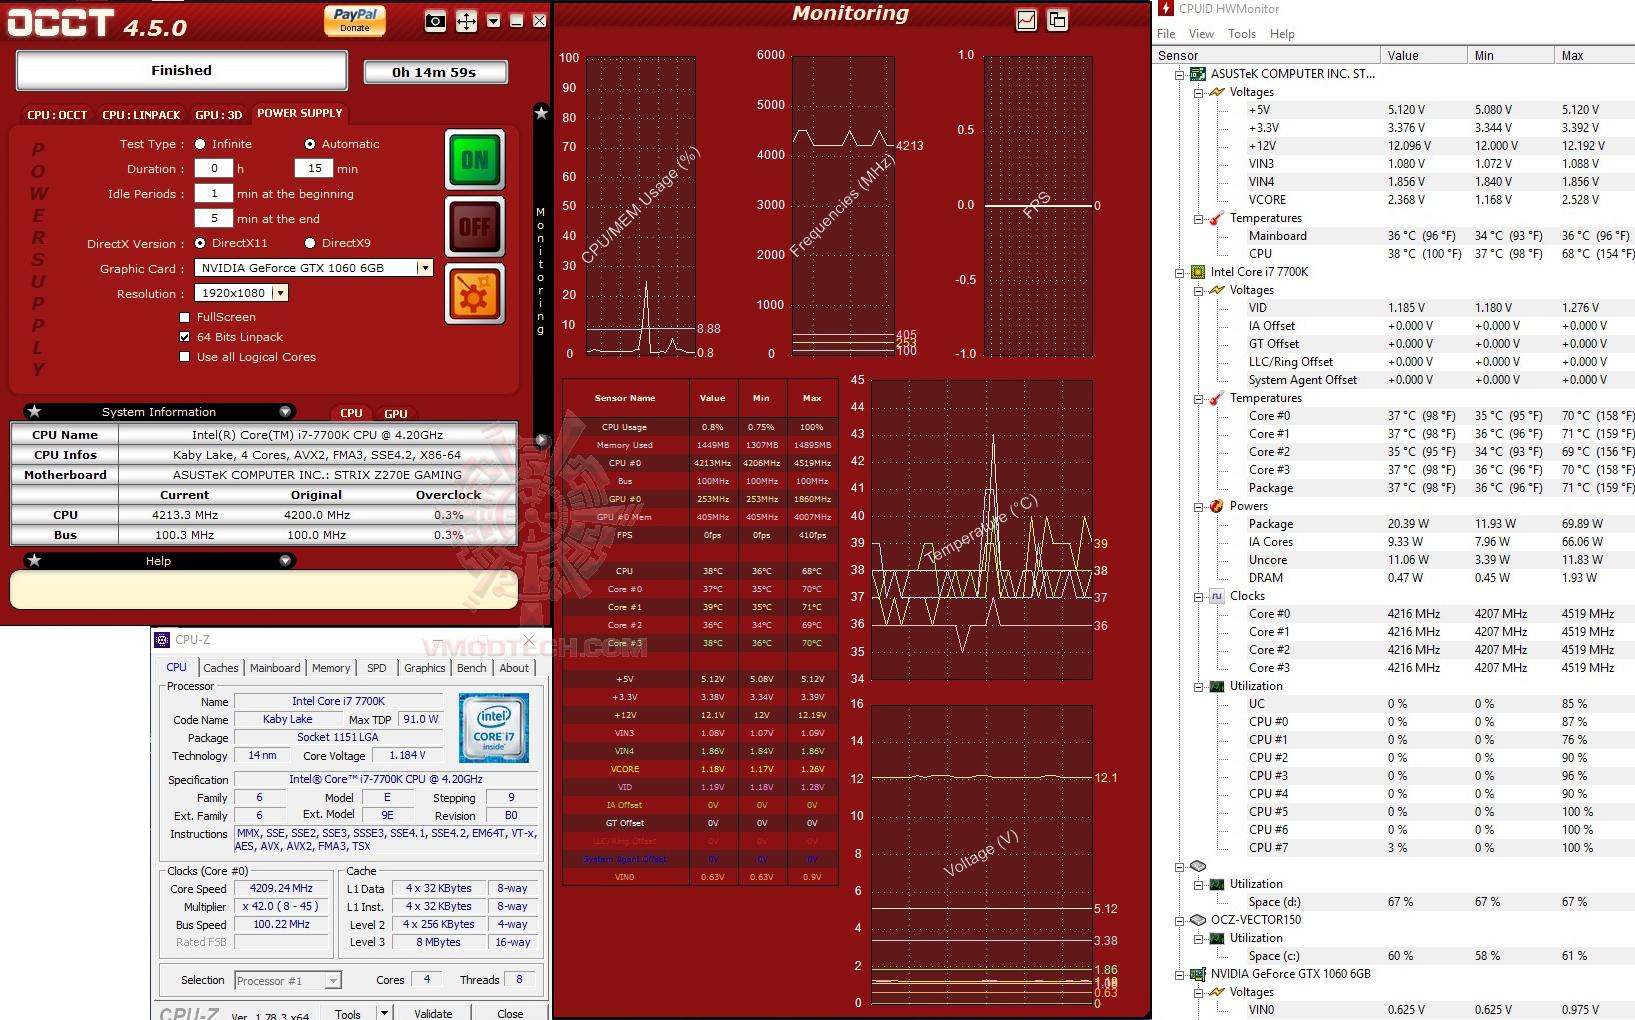 occt NAGAN MP 1450G MINING POWER SUPPLY REVIEW